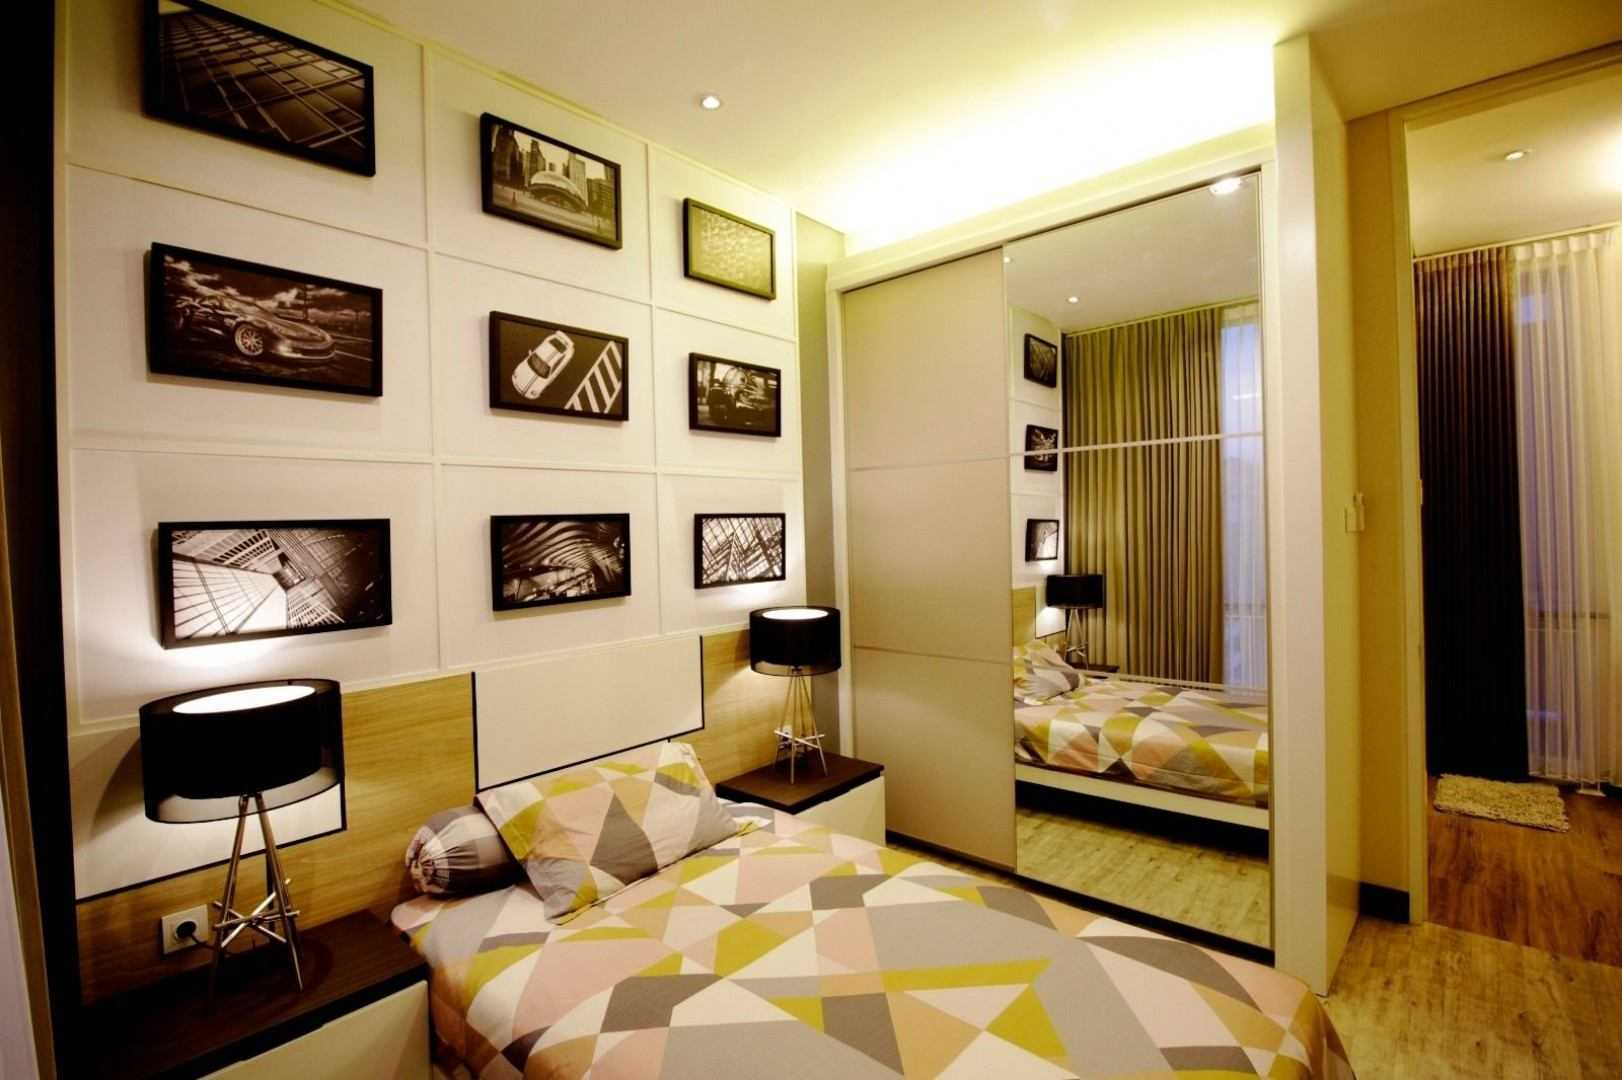 Kottagaris Interior Design Consultant Mr L Residence Surabaya, Kota Sby, Jawa Timur, Indonesia Surabaya, Kota Sby, Jawa Timur, Indonesia Bedroom View Klasik 54611